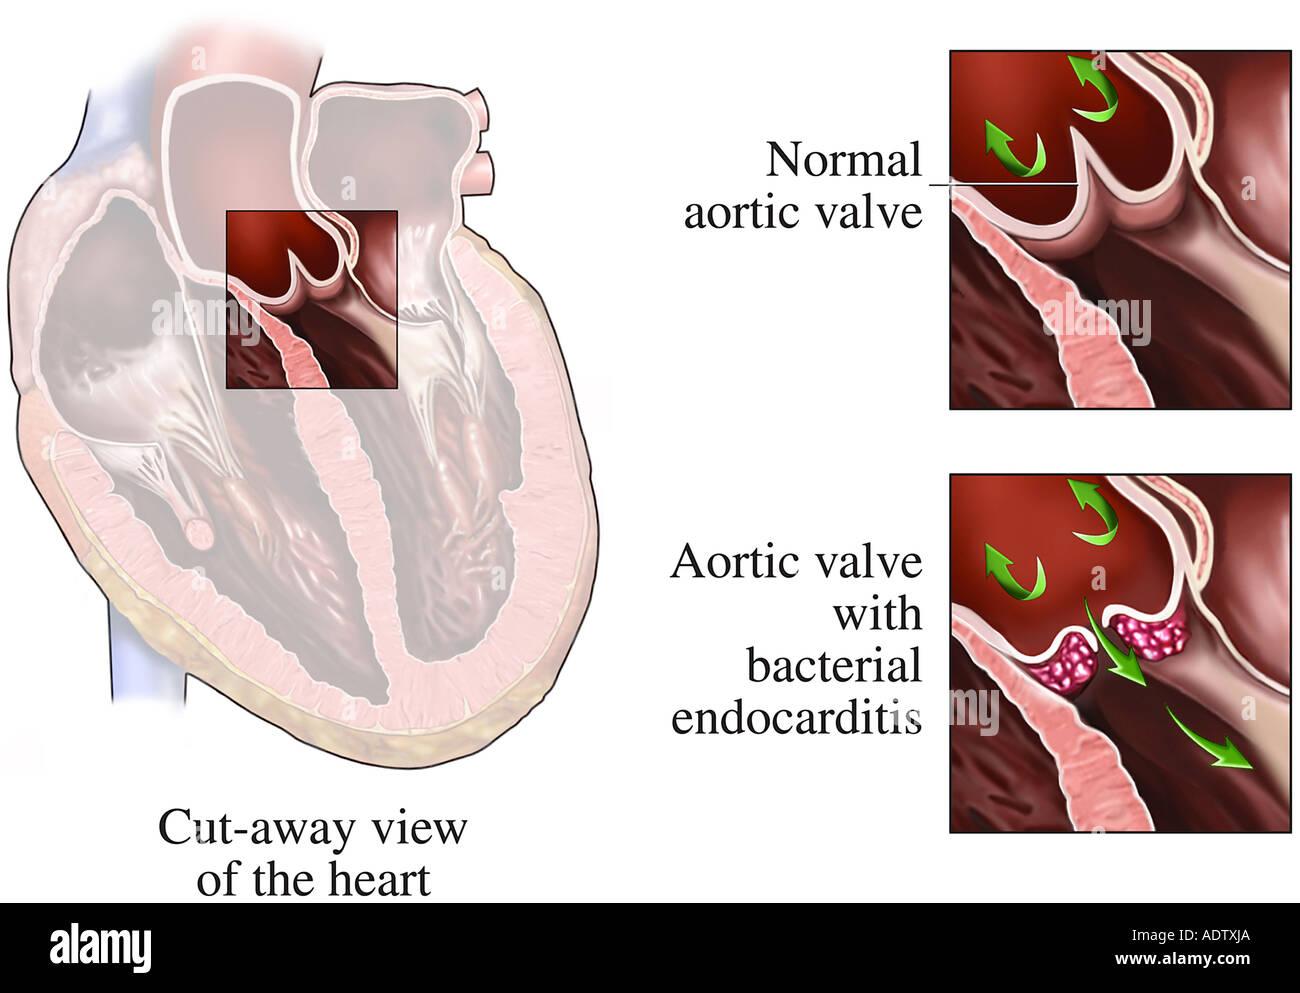 Aortic Stockfotos & Aortic Bilder - Alamy